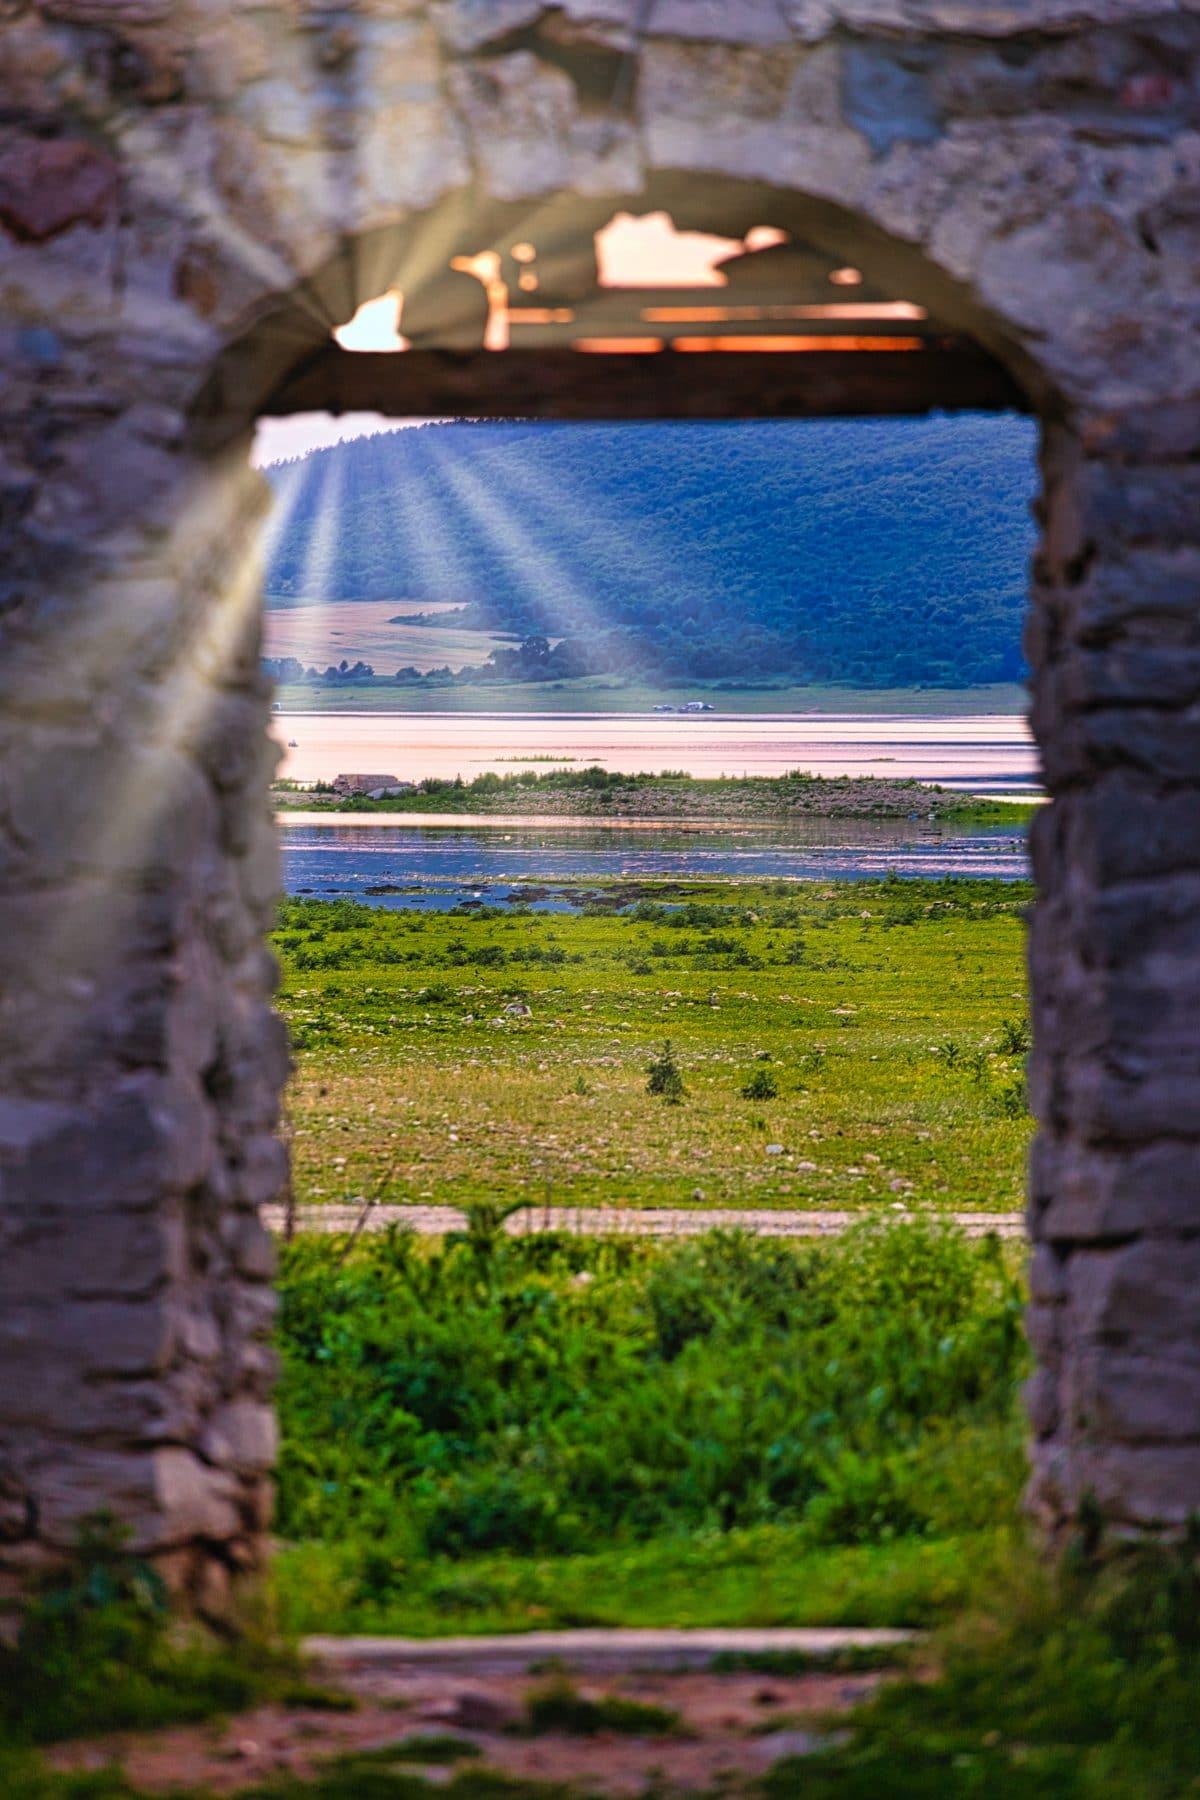 bulgarie pays europe voyage vacances mer noire